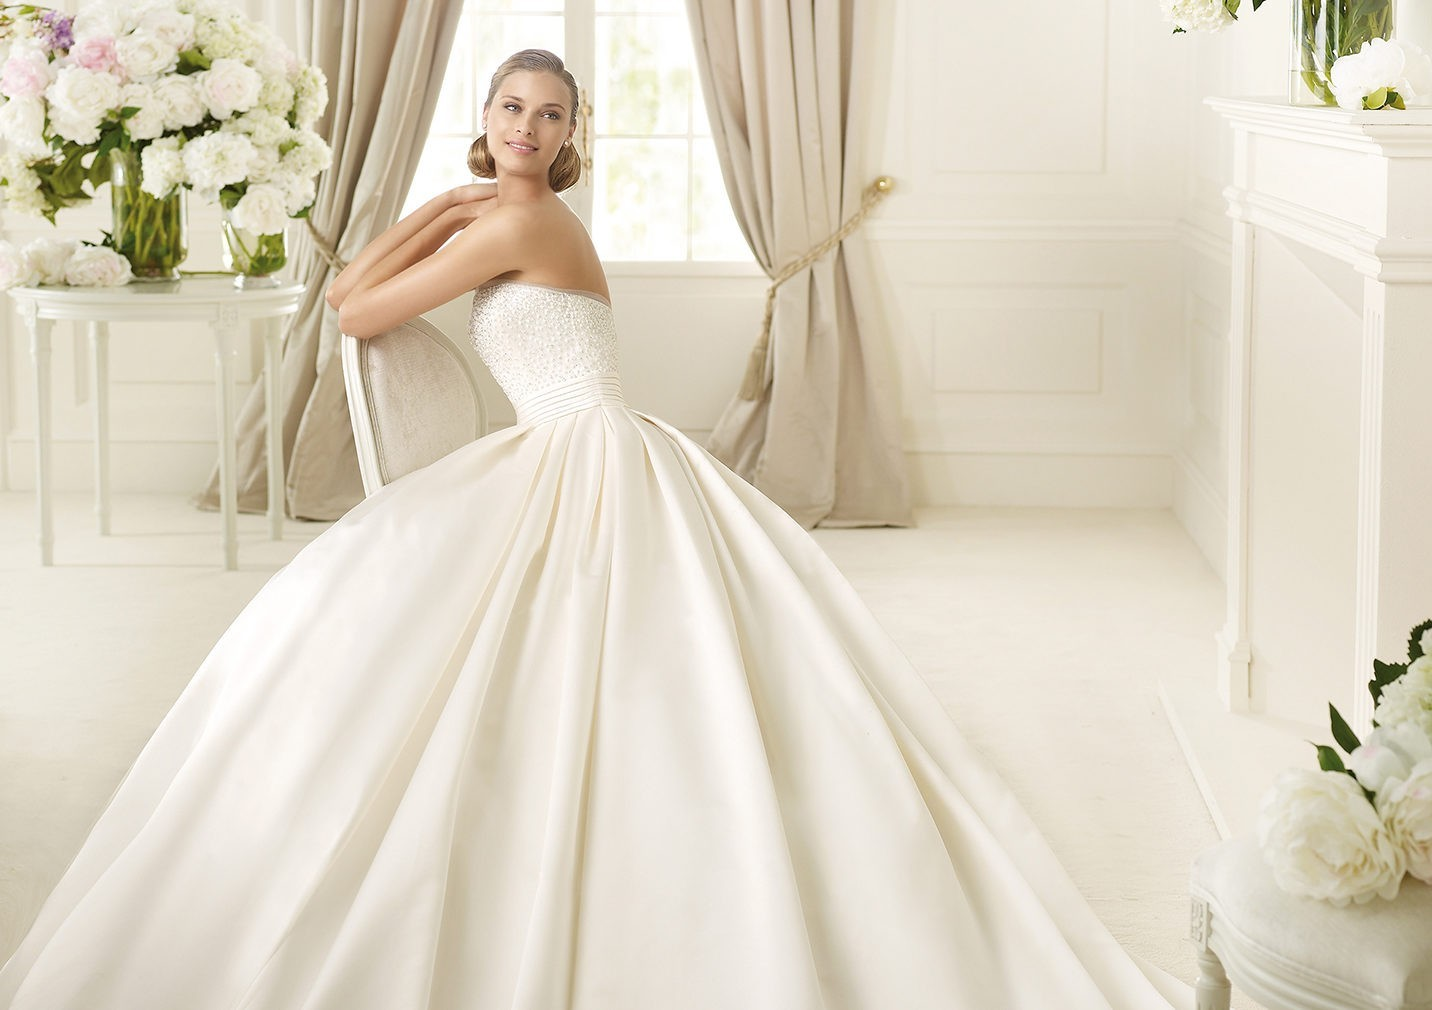 statia svadebnye platia